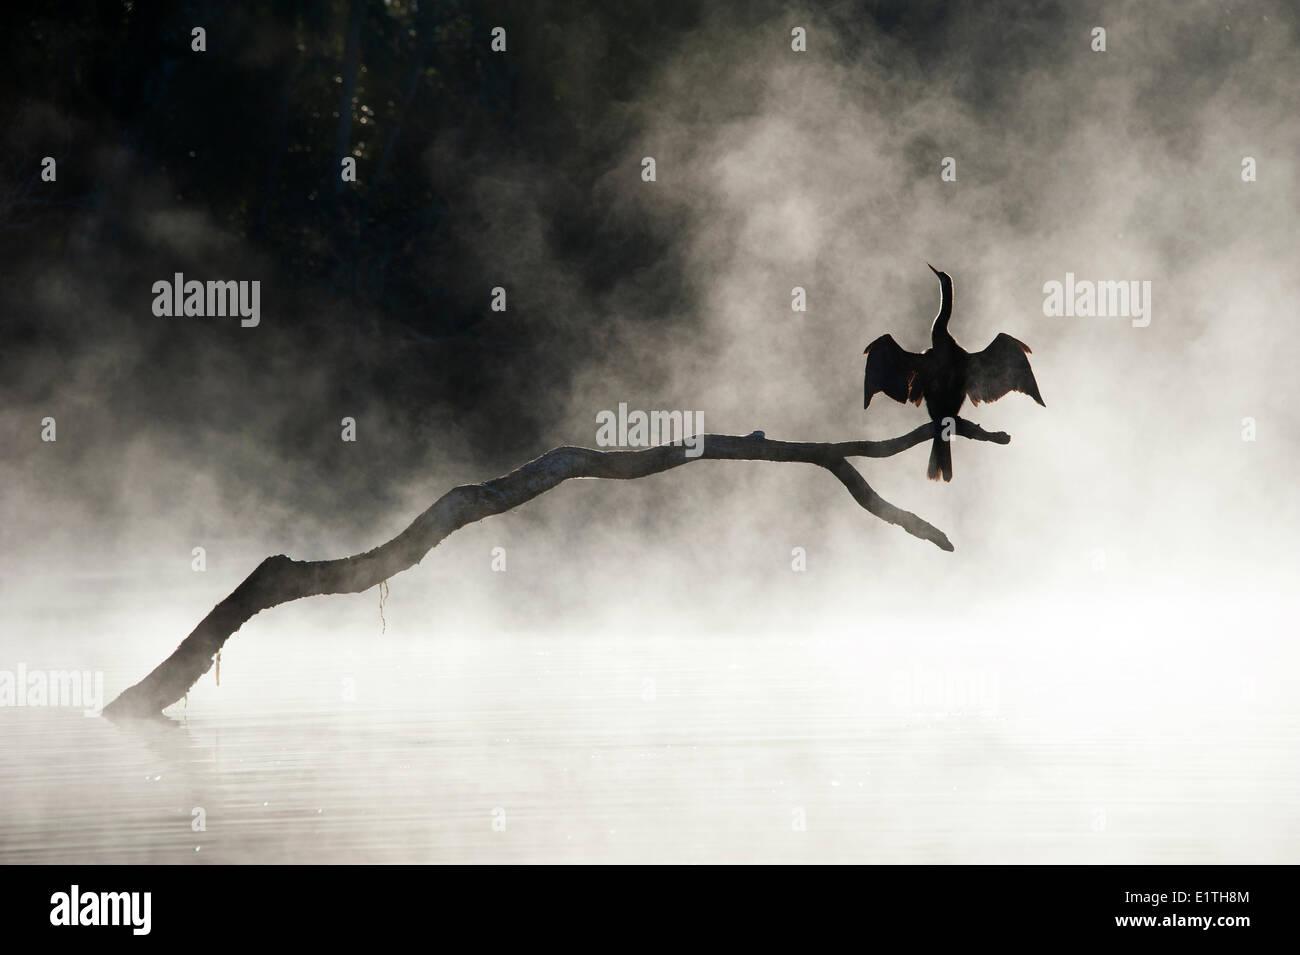 Adult anhinga (anhinga anhinga) drying its wings in the mist an winter morning Chassahowitzka National Wildlife Refuge - Stock Image